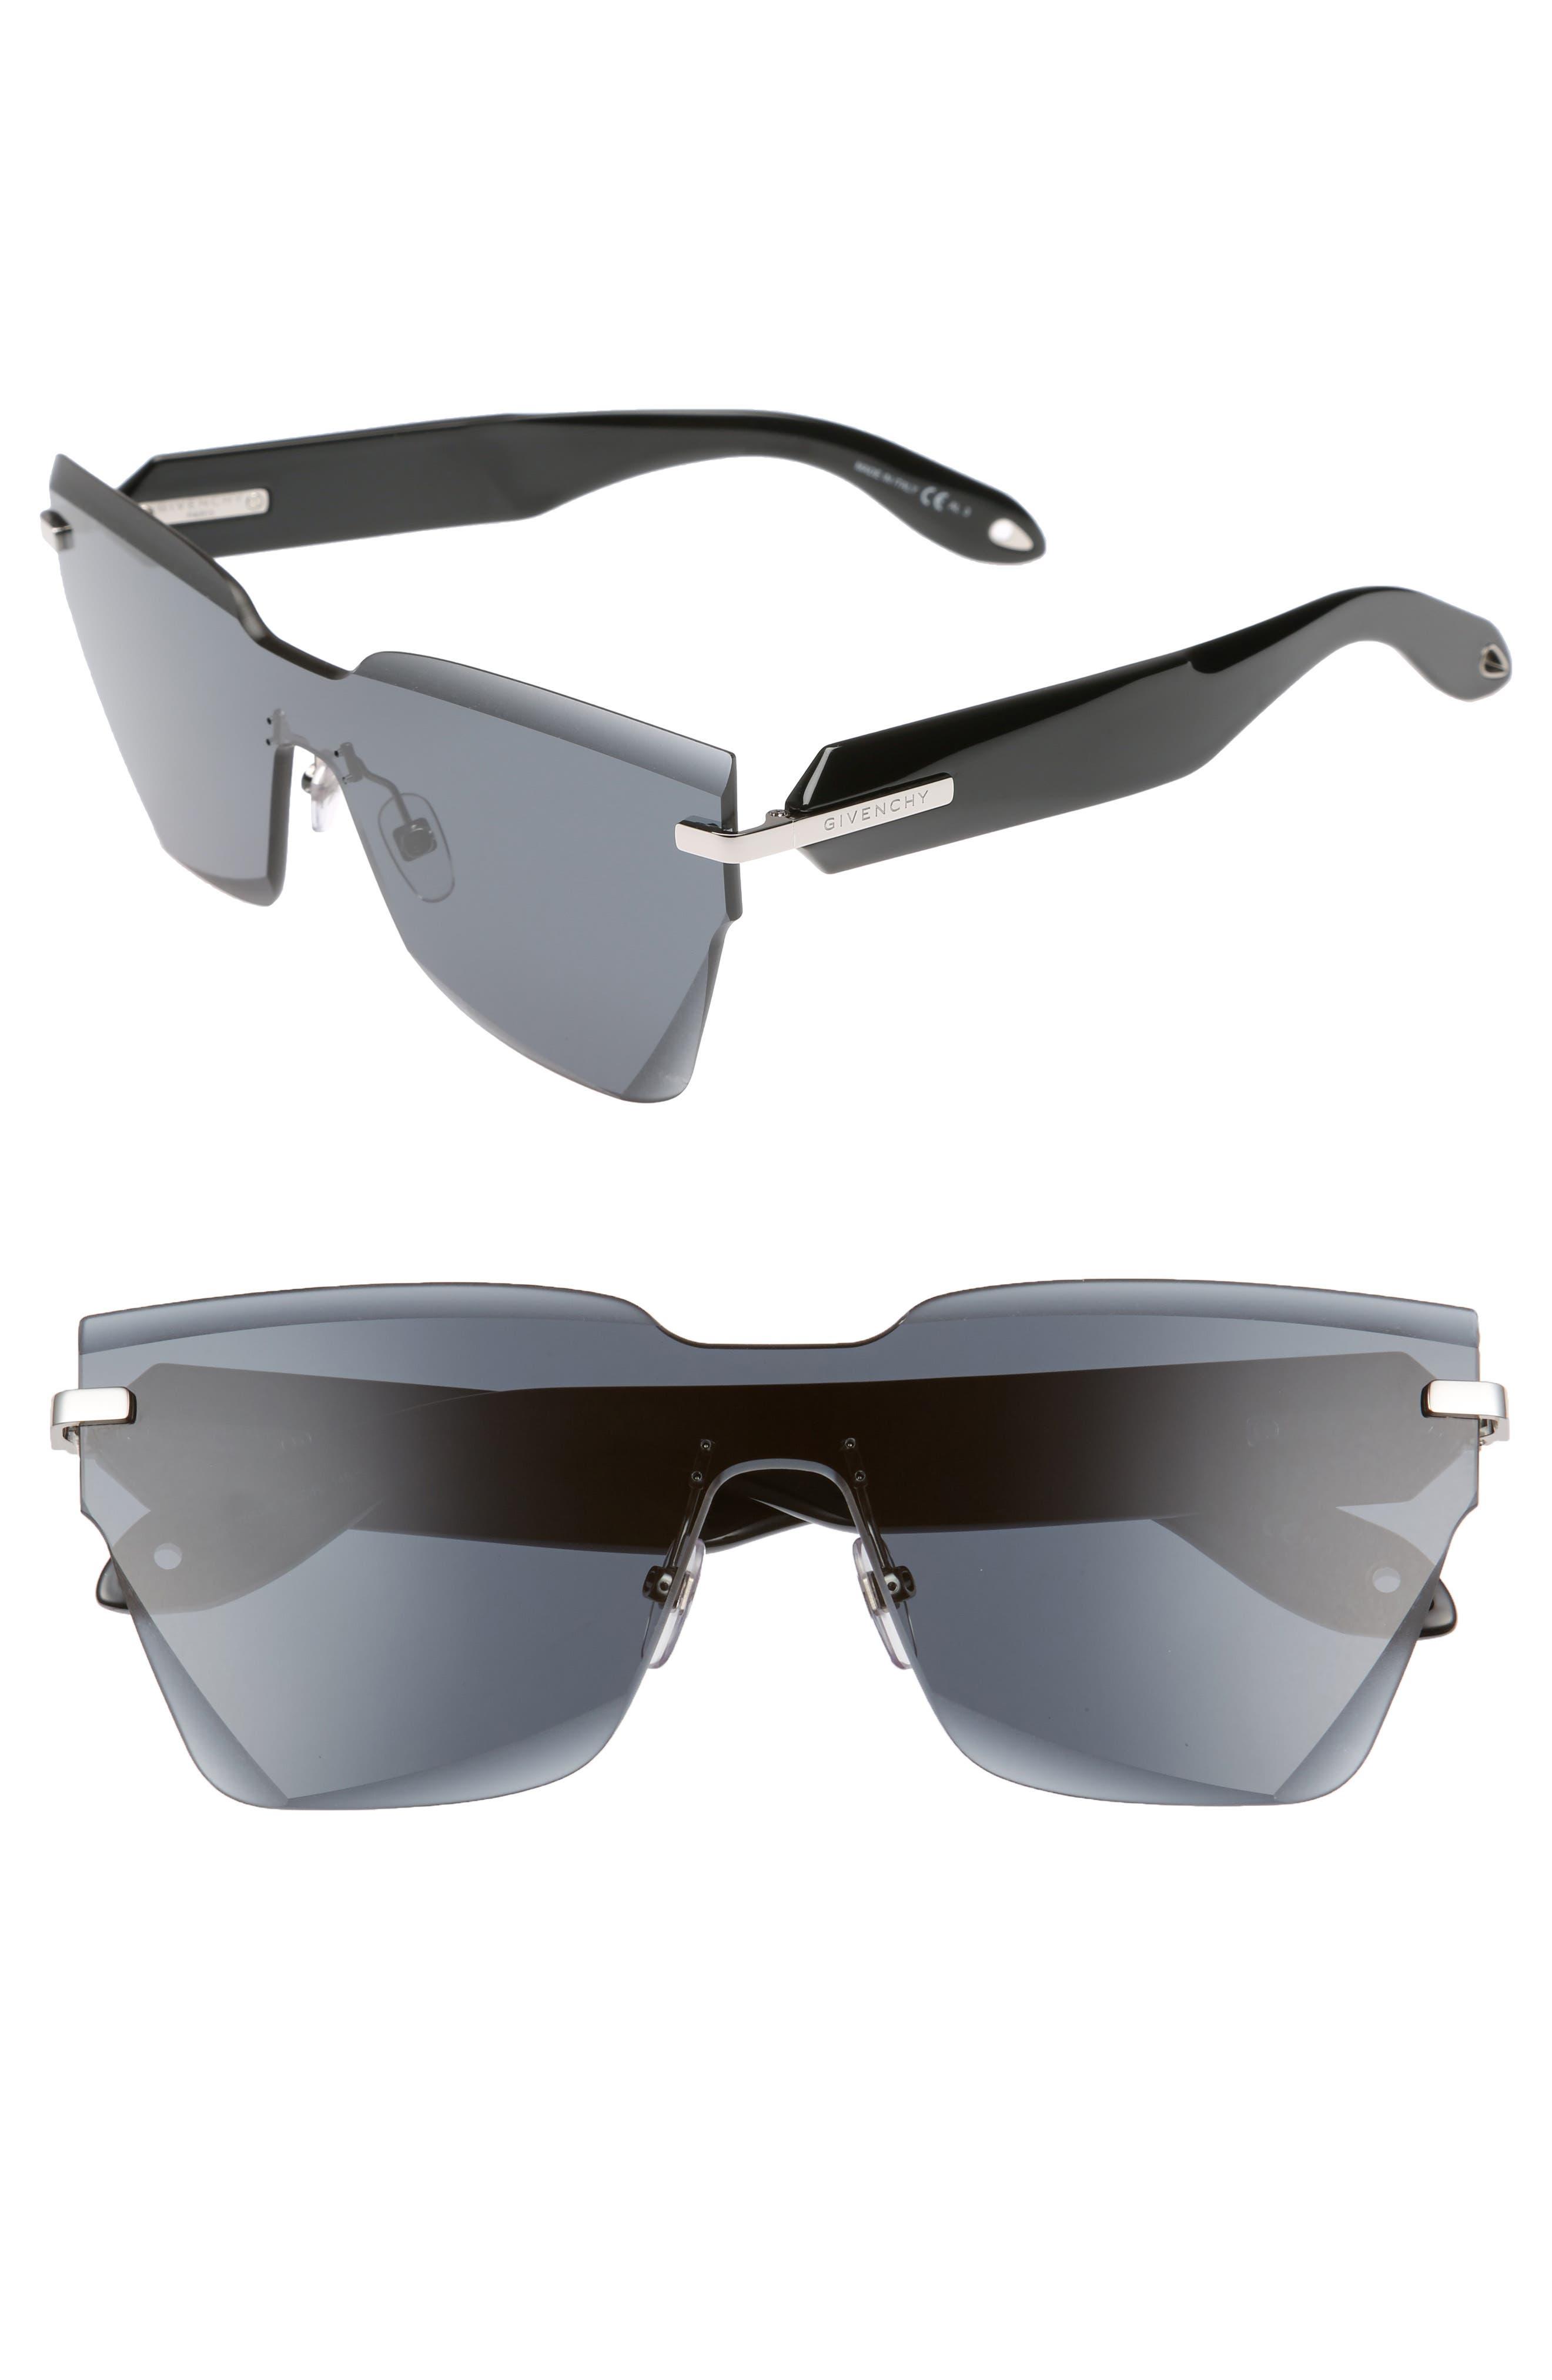 Main Image - Givenchy 55mm Rimless Shield Sunglasses